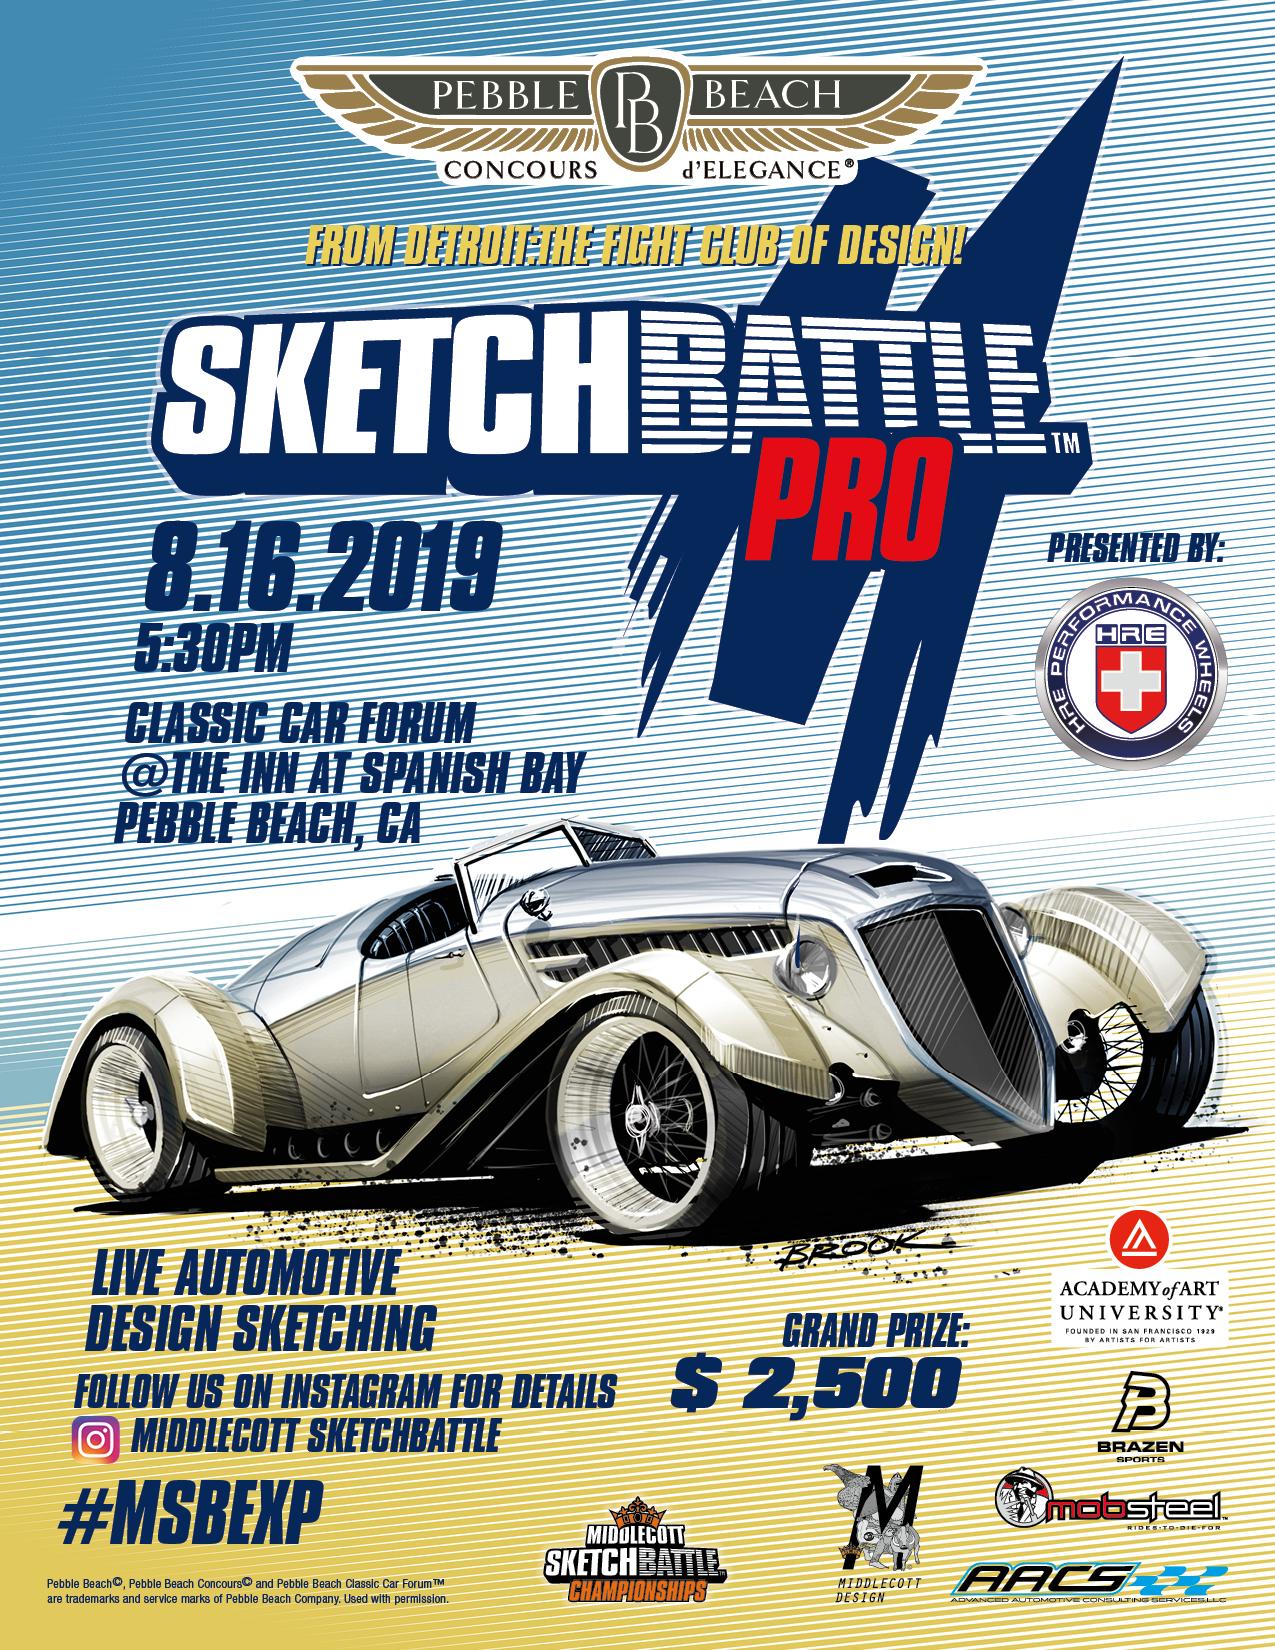 Sketchbattle Pro #18 Pebble Beach flyer_10